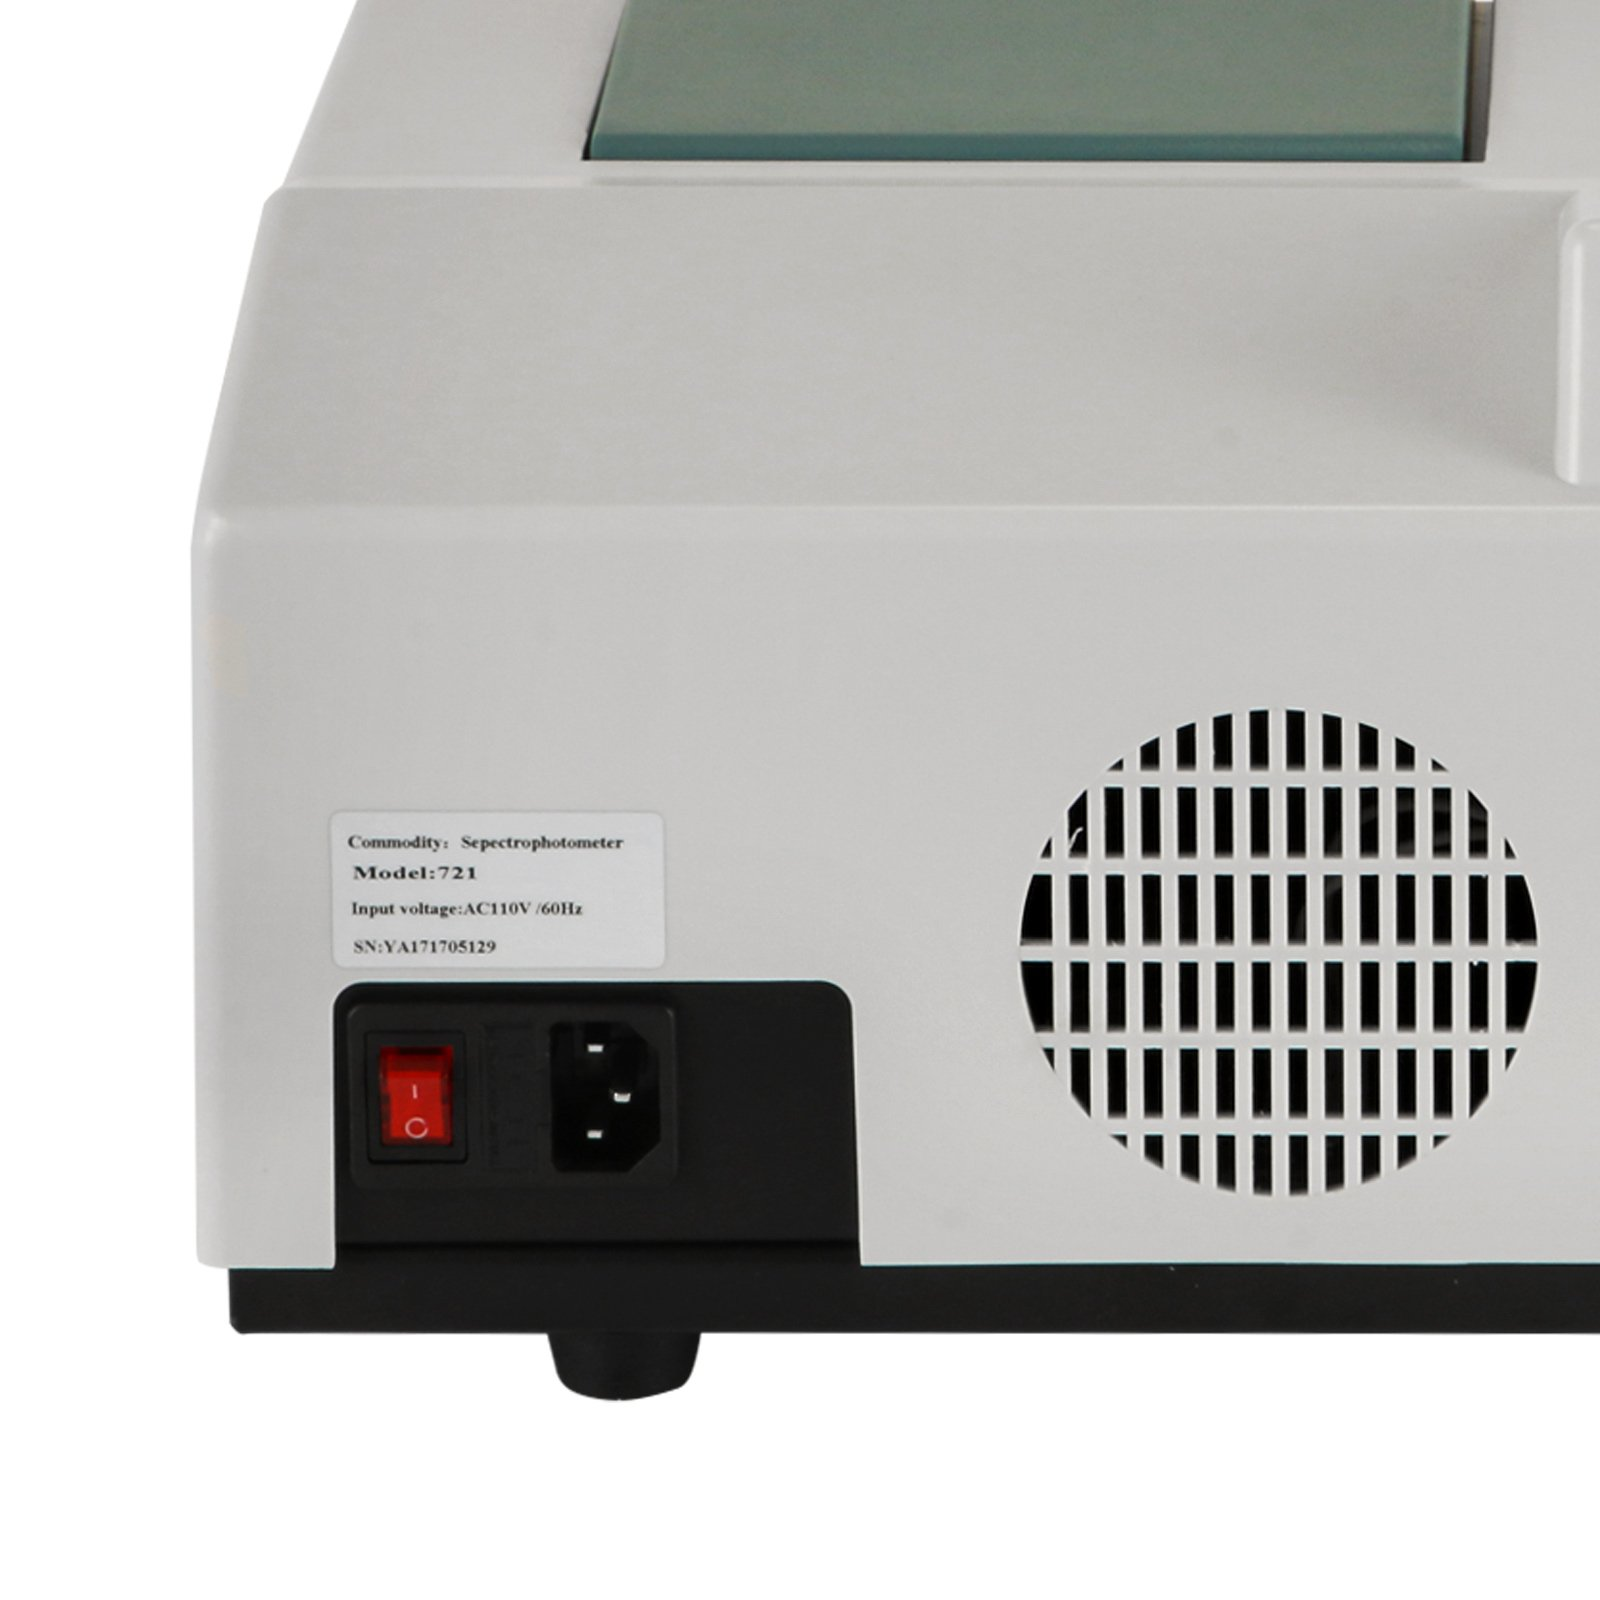 BestEquip 6nm Visible Spectrophotometer 721 350-1020nm Wavelength Range Spectrophotometer Portable Lab Equipment (Type 721)